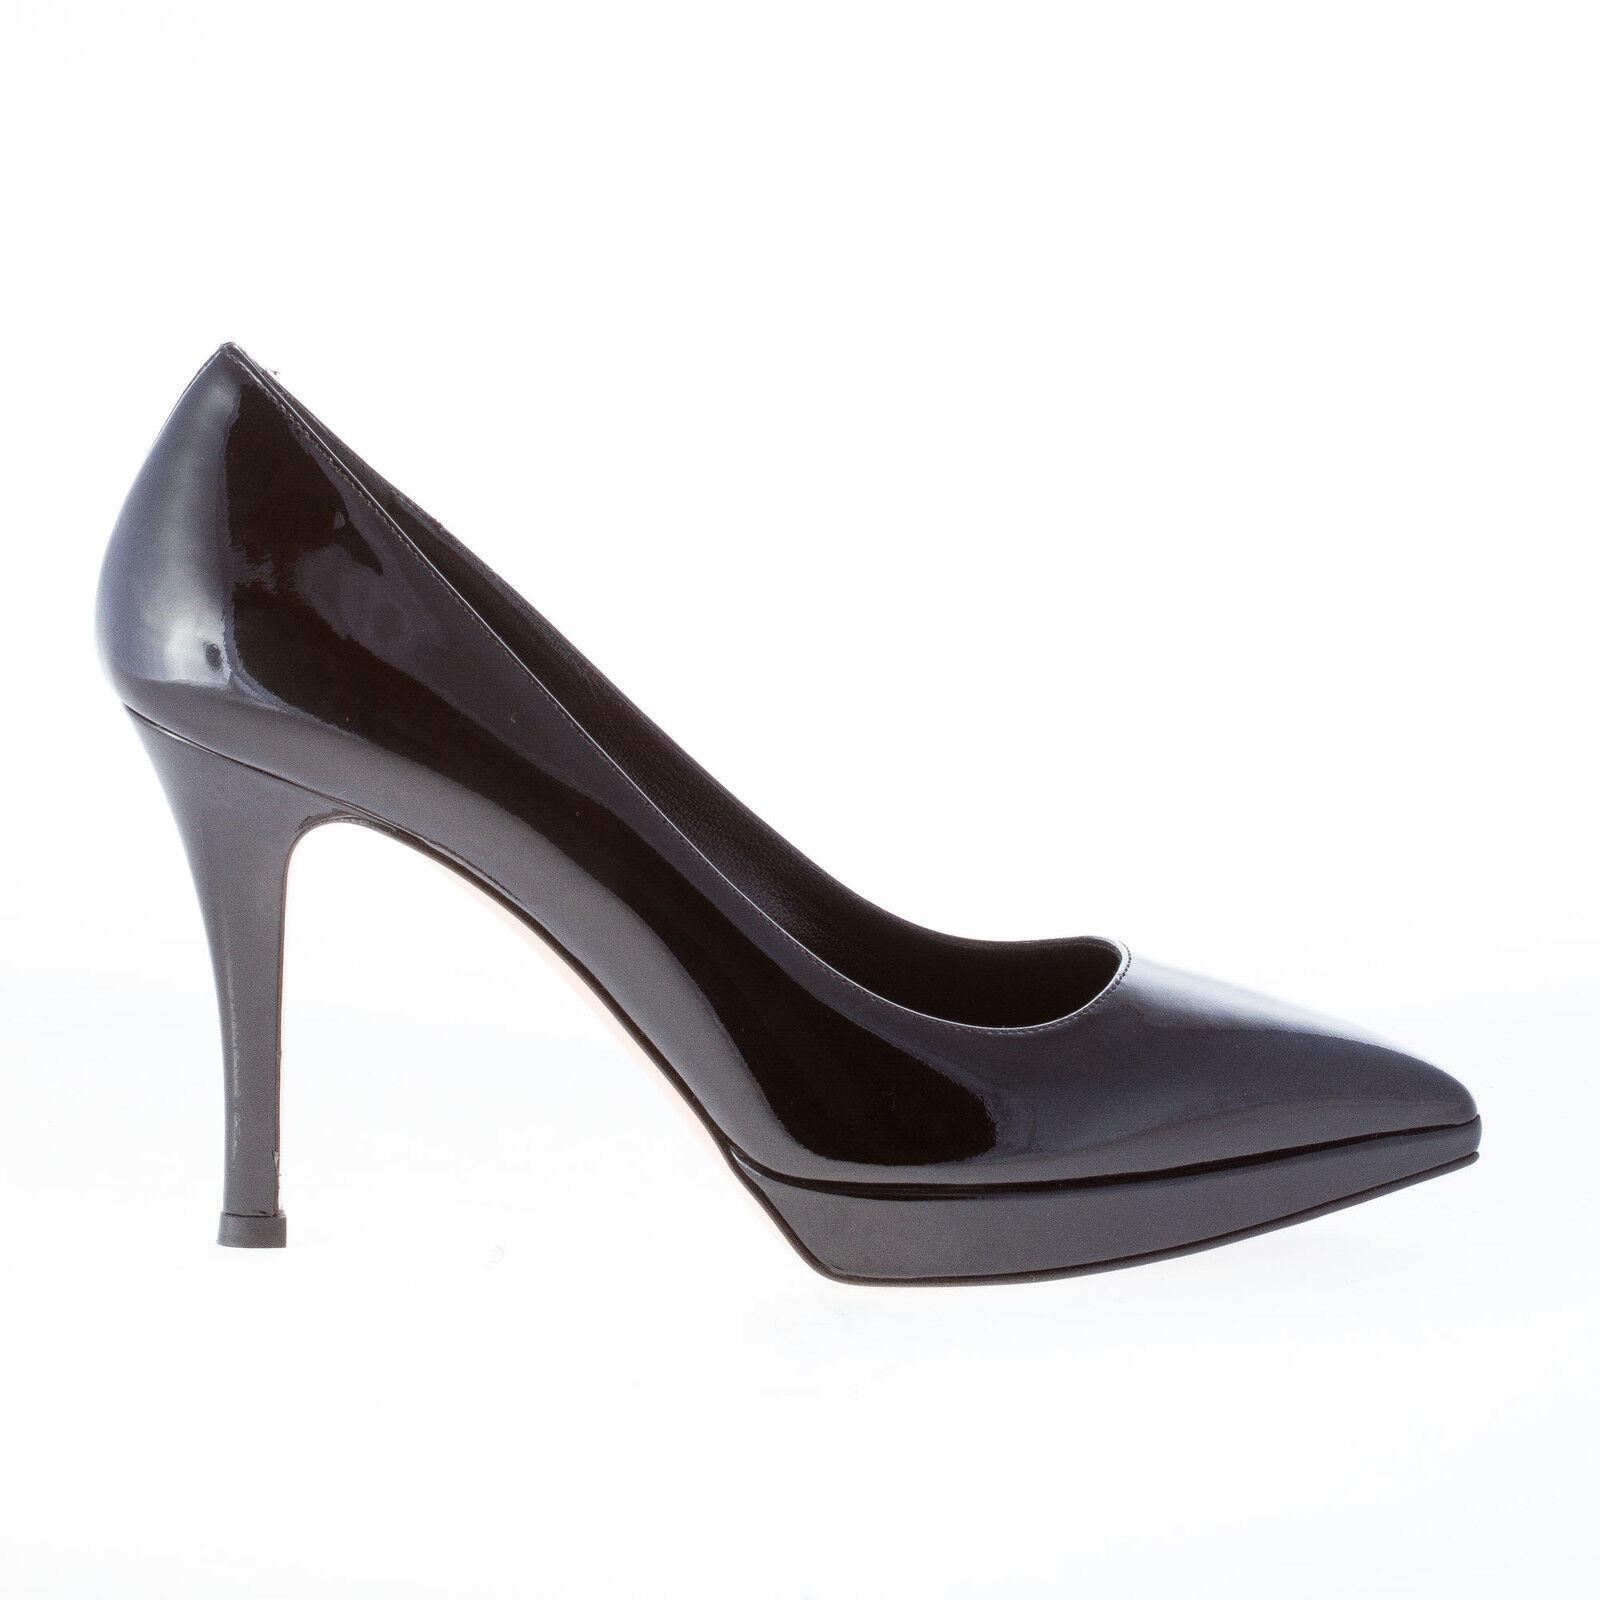 SEMILLA scarpe scarpe donna donna scarpe SEMILLA Donna Scarpe Decolletè in vernice   a63983